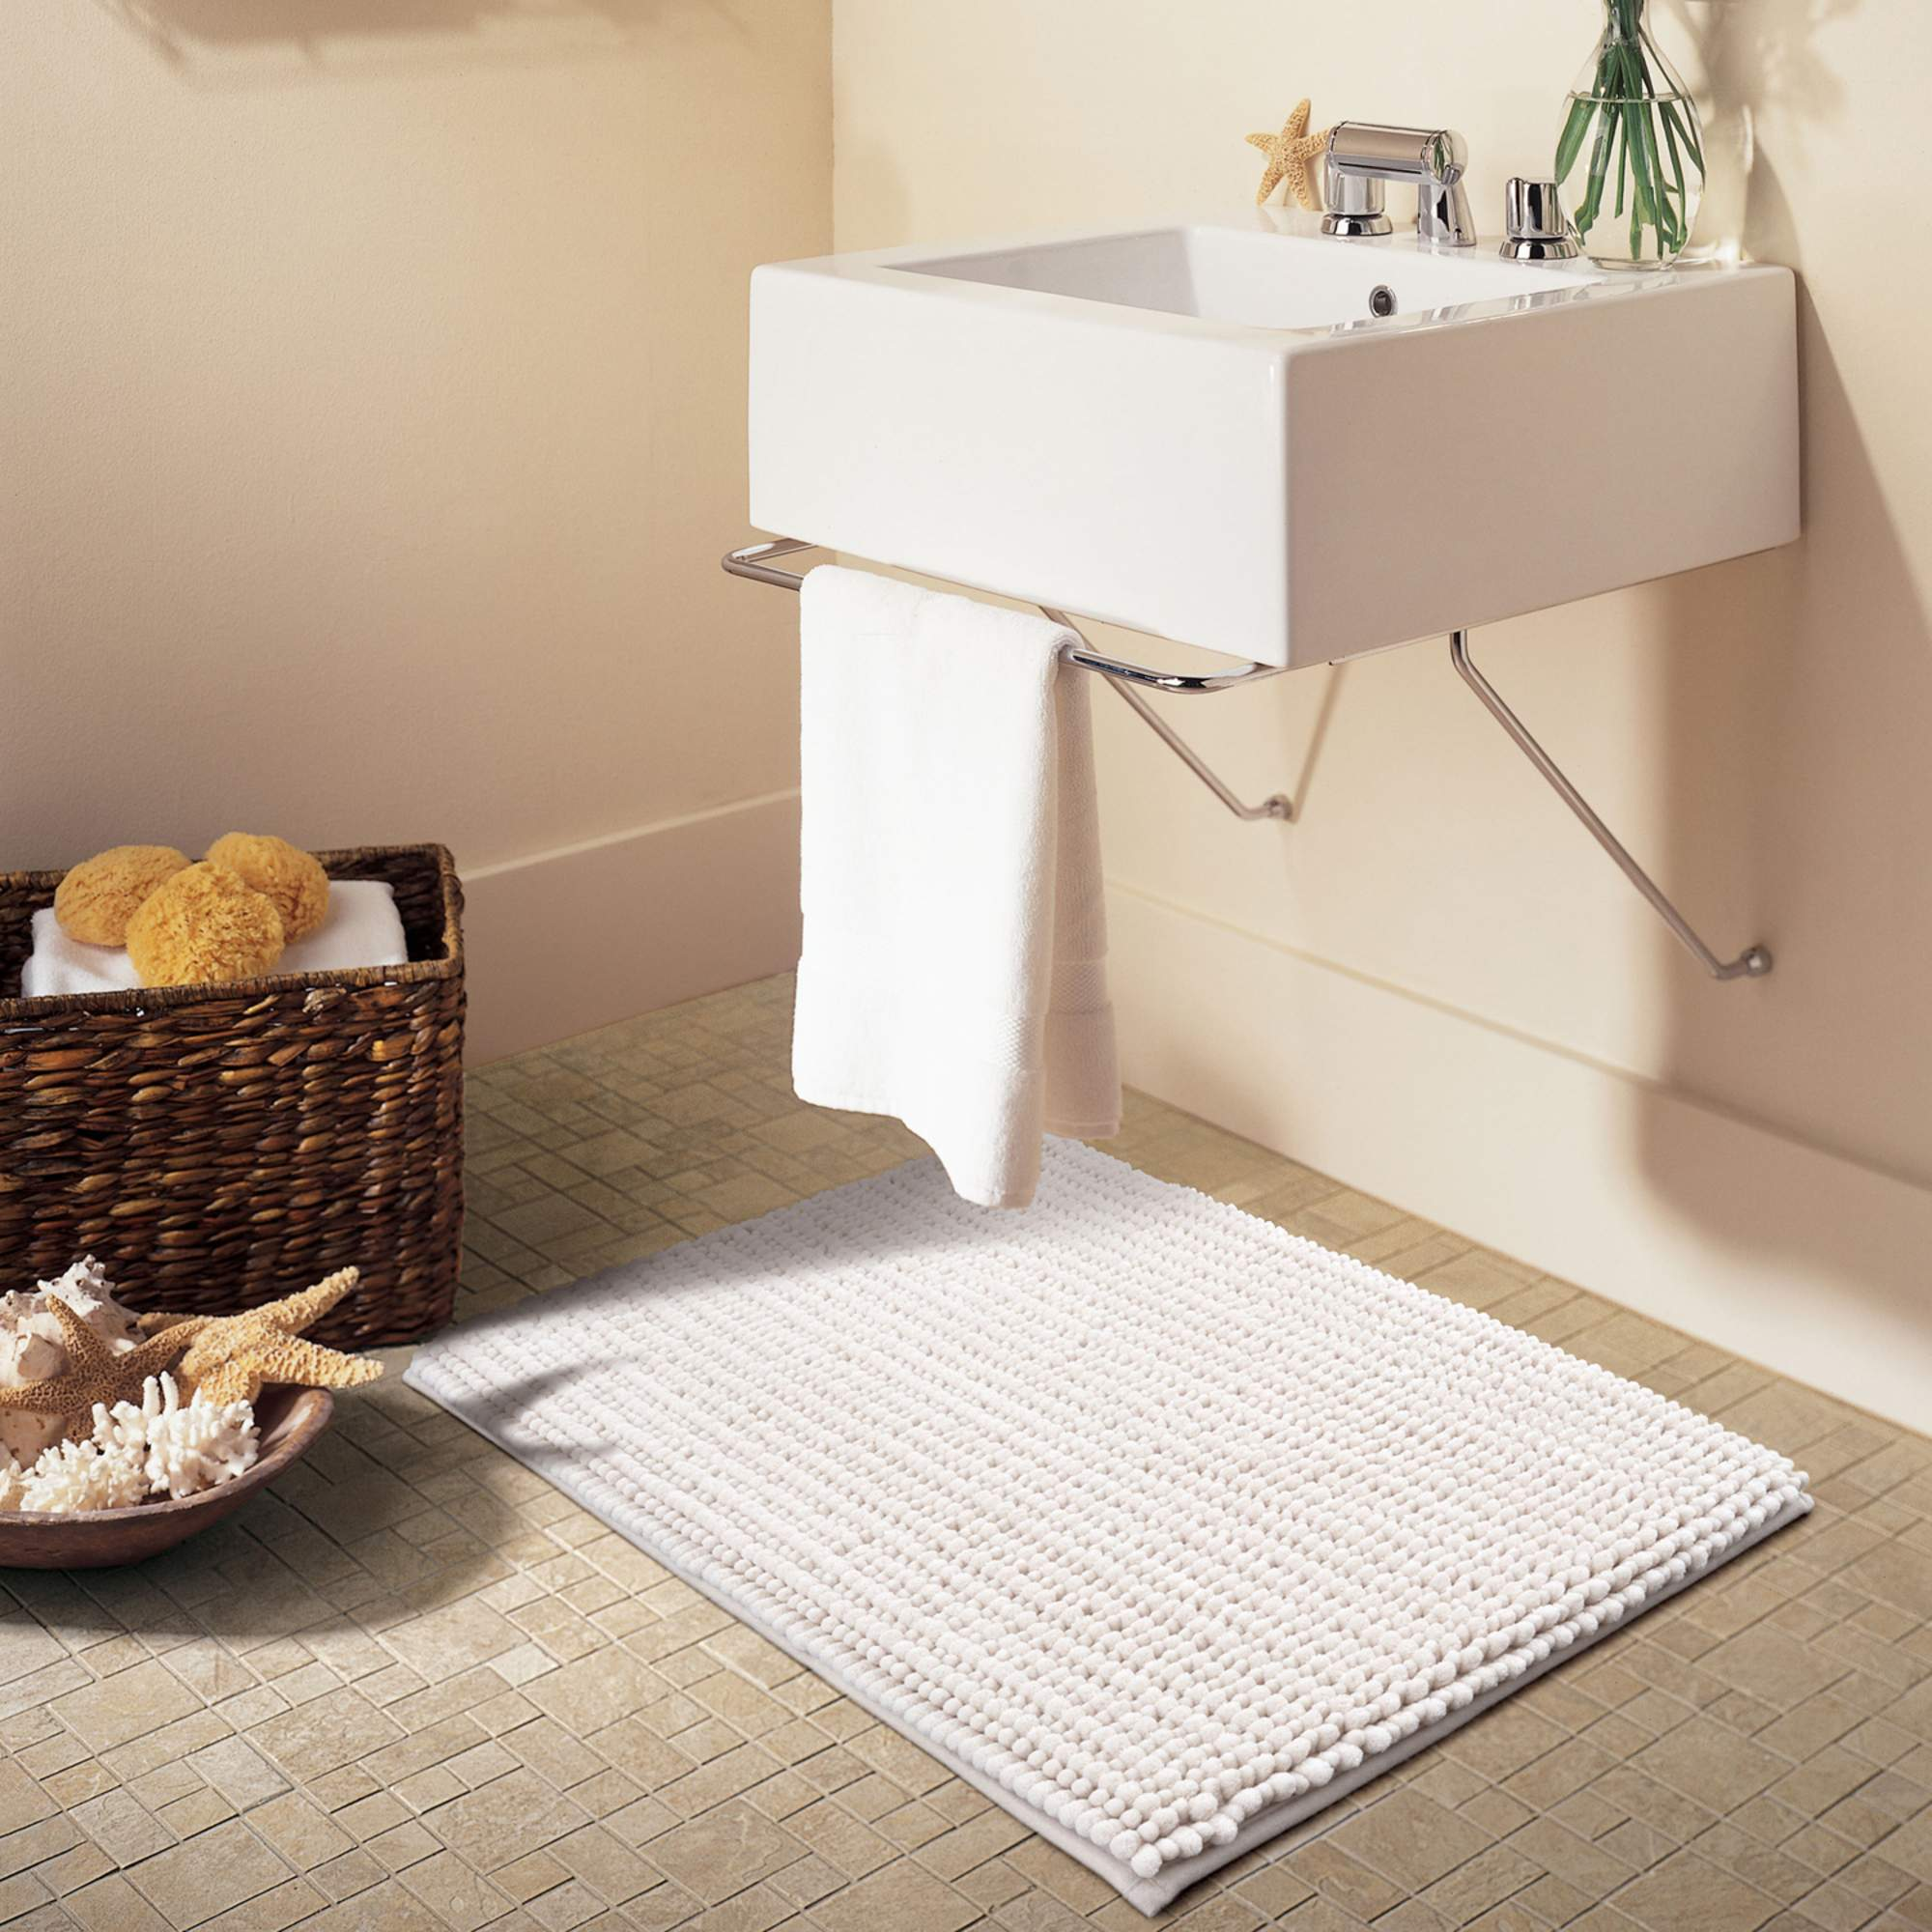 "Better Homes & Gardens Noodle Memory Foam Bath Rug, 20"" x 34"", Terrance Green"